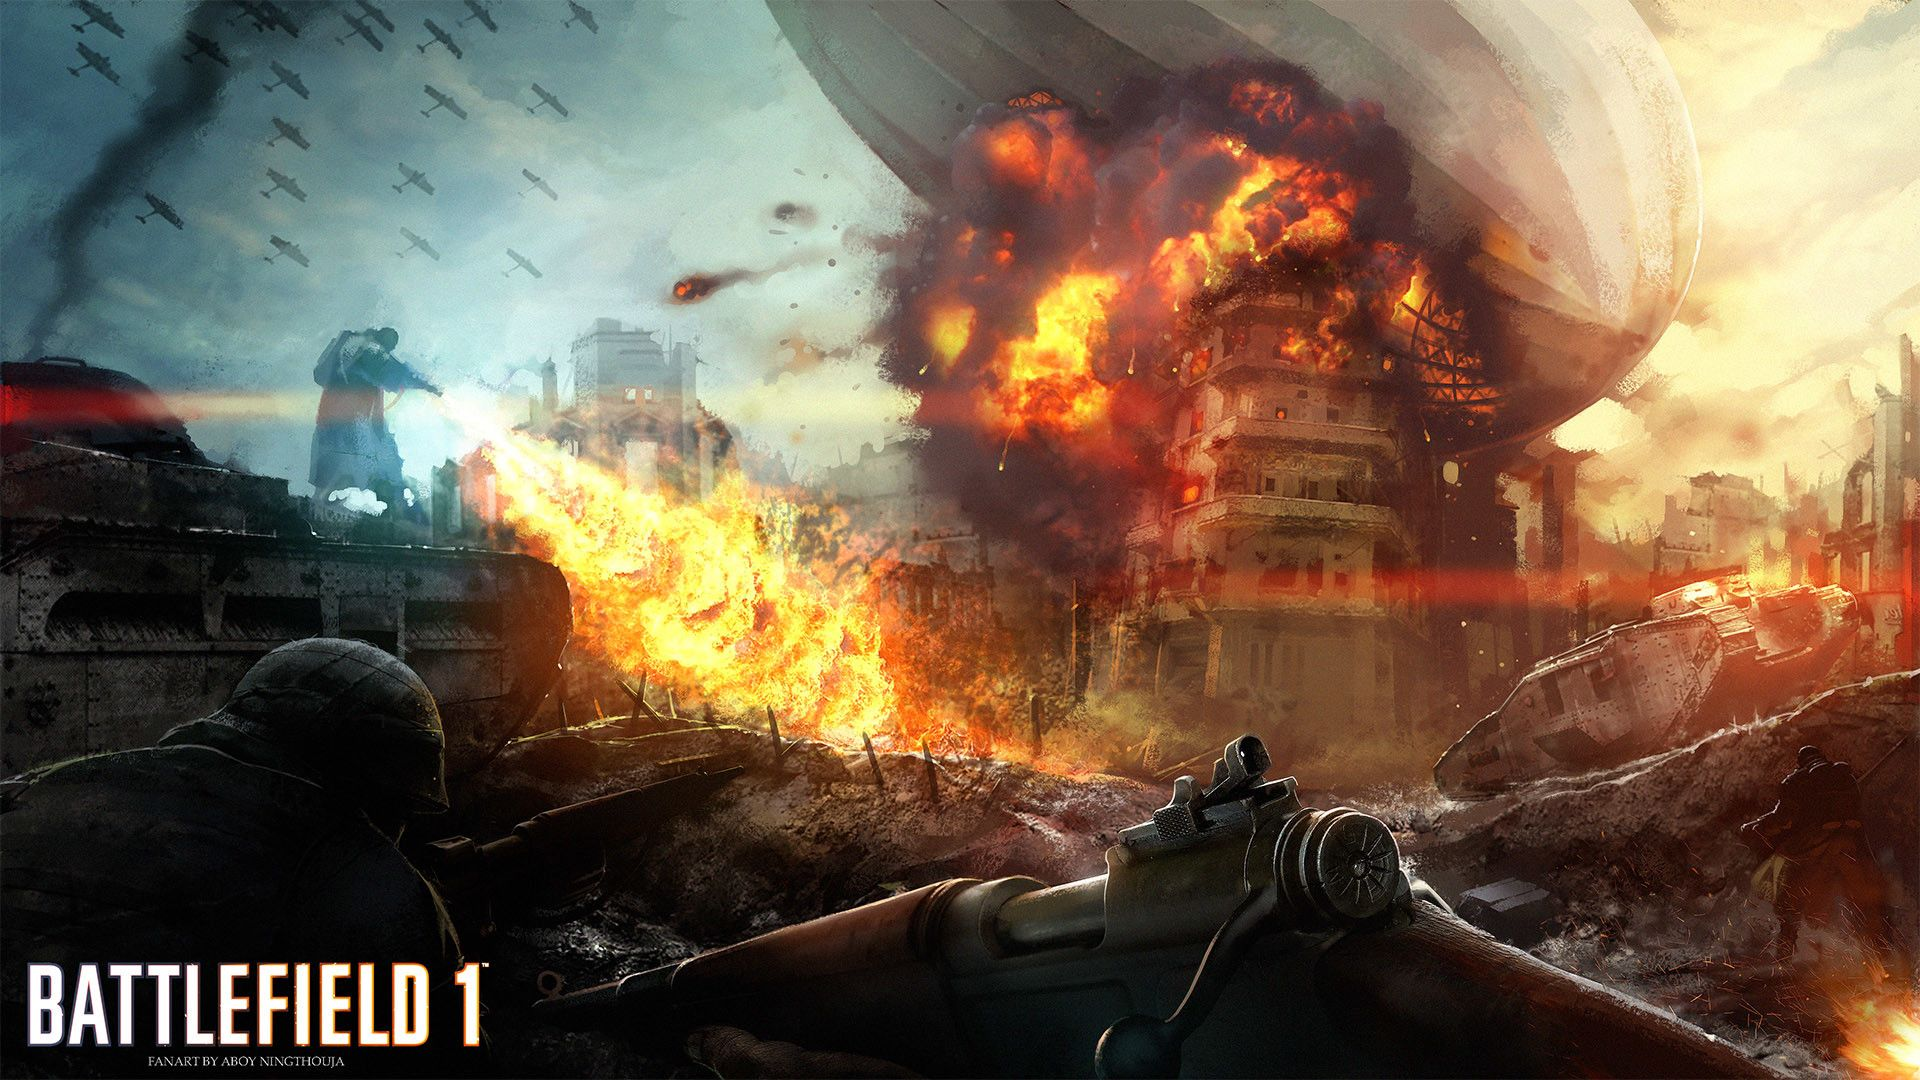 Ferocious Battlefield 1 [1920x1080] | Beautiful Wallpaper